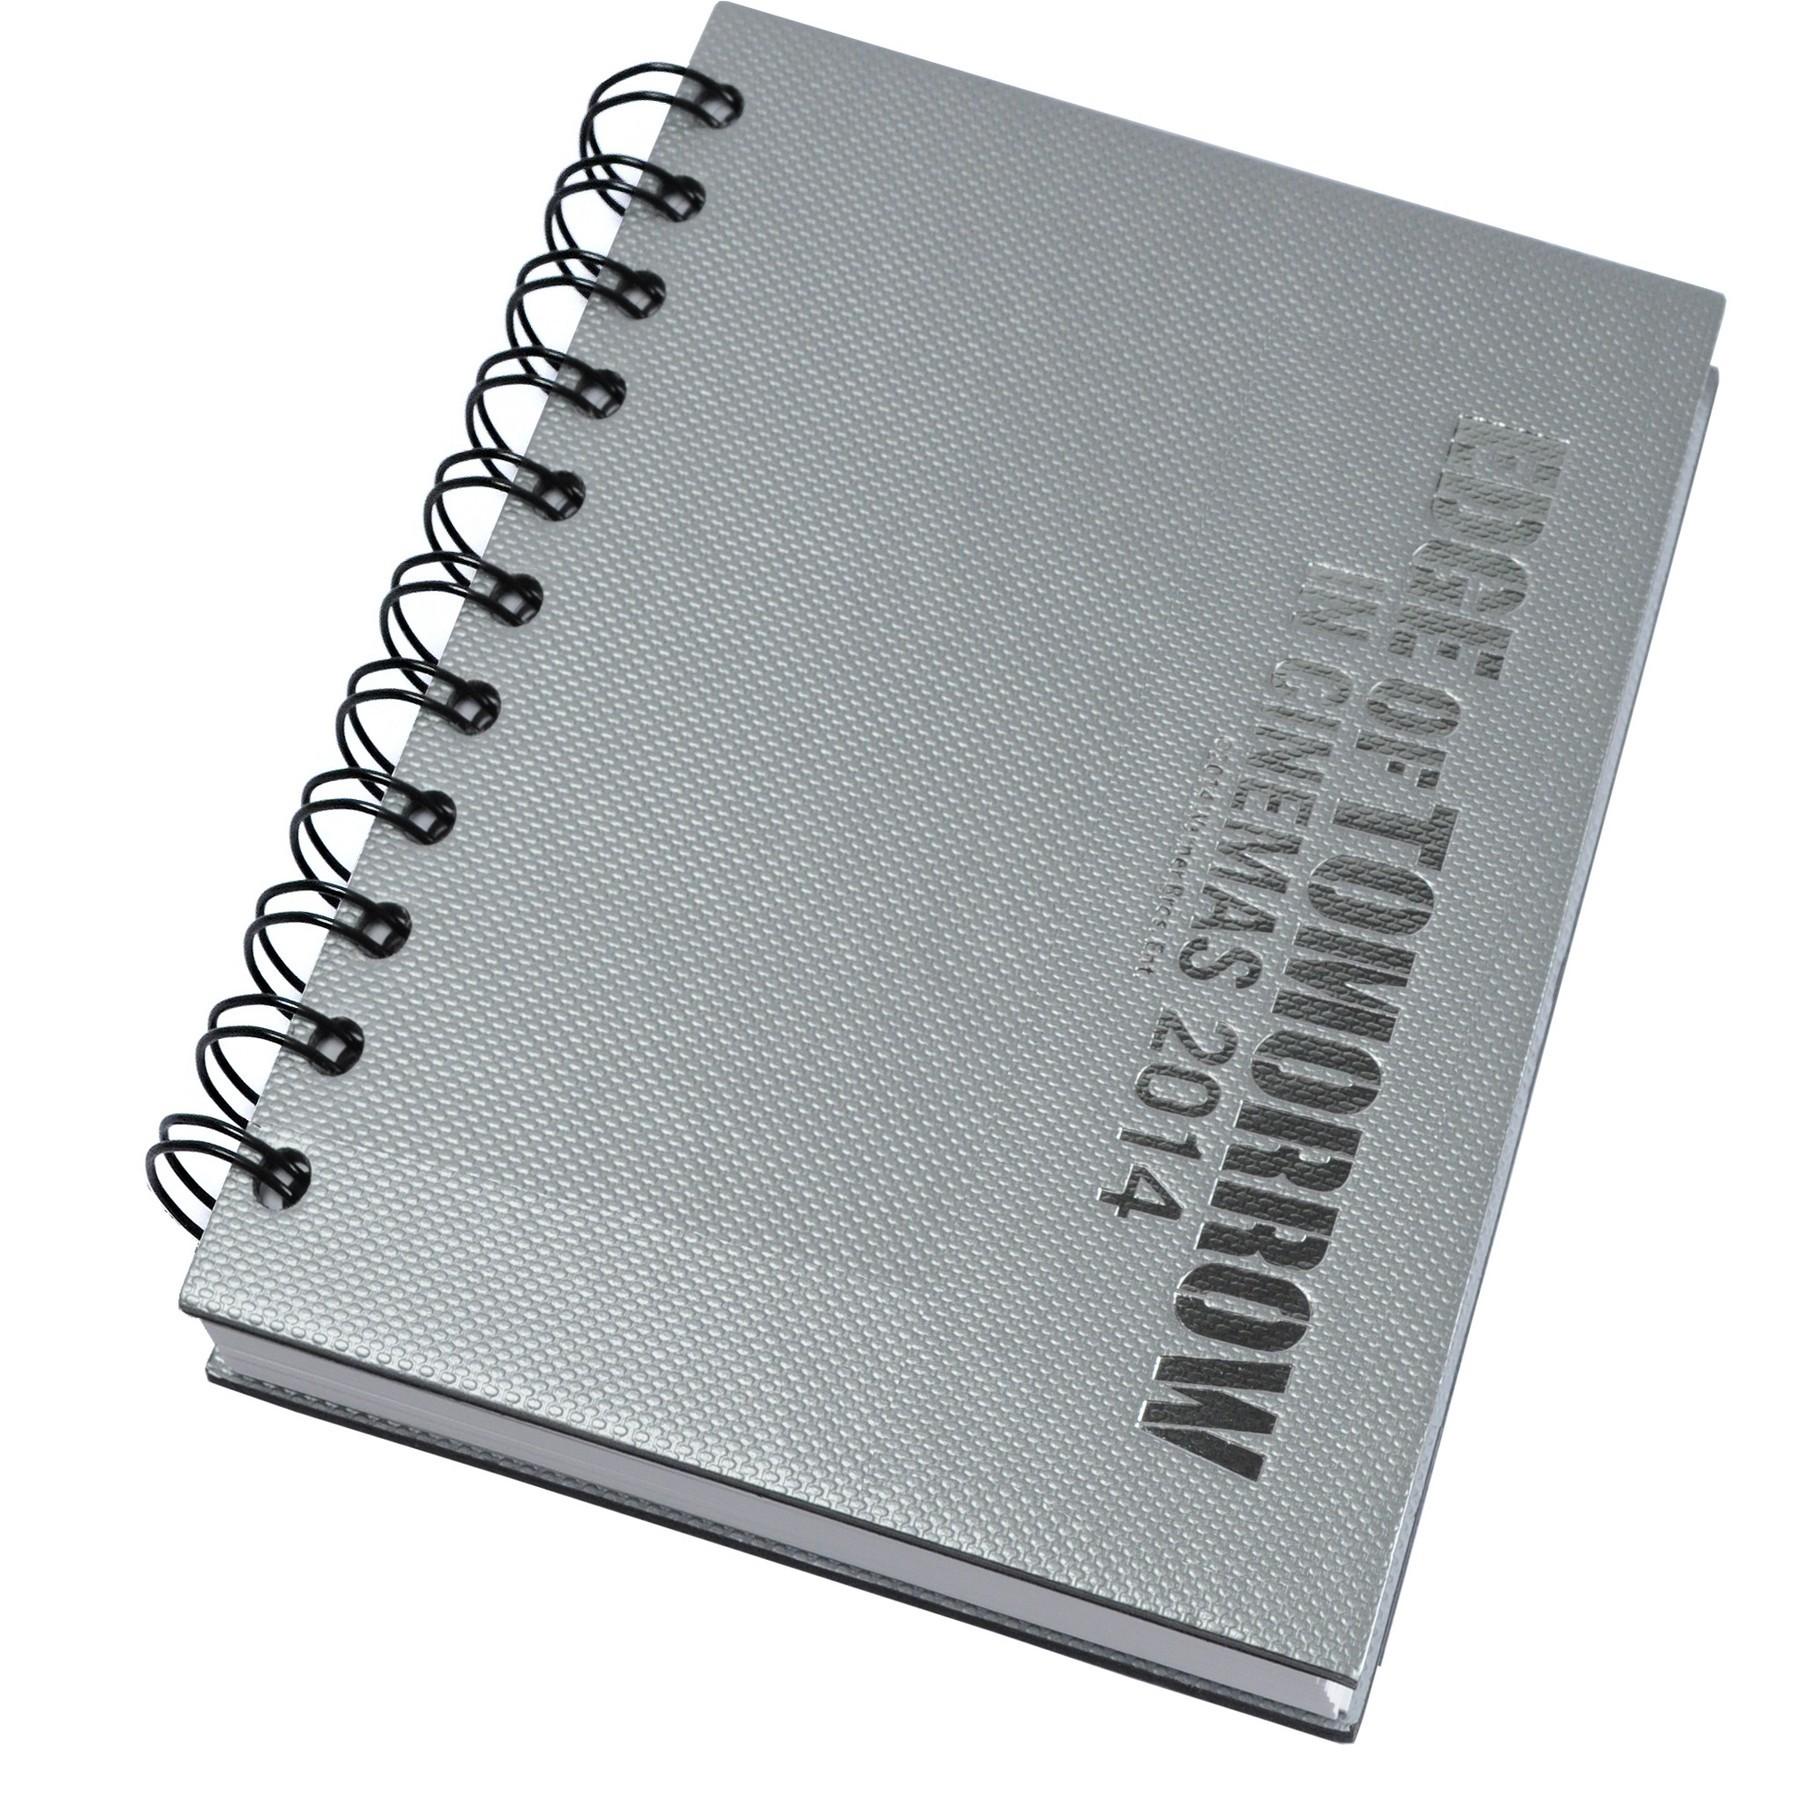 Boardroom Basics Spiral Journals w/ 100 Sheets 4″ x 6″ | Branded ...